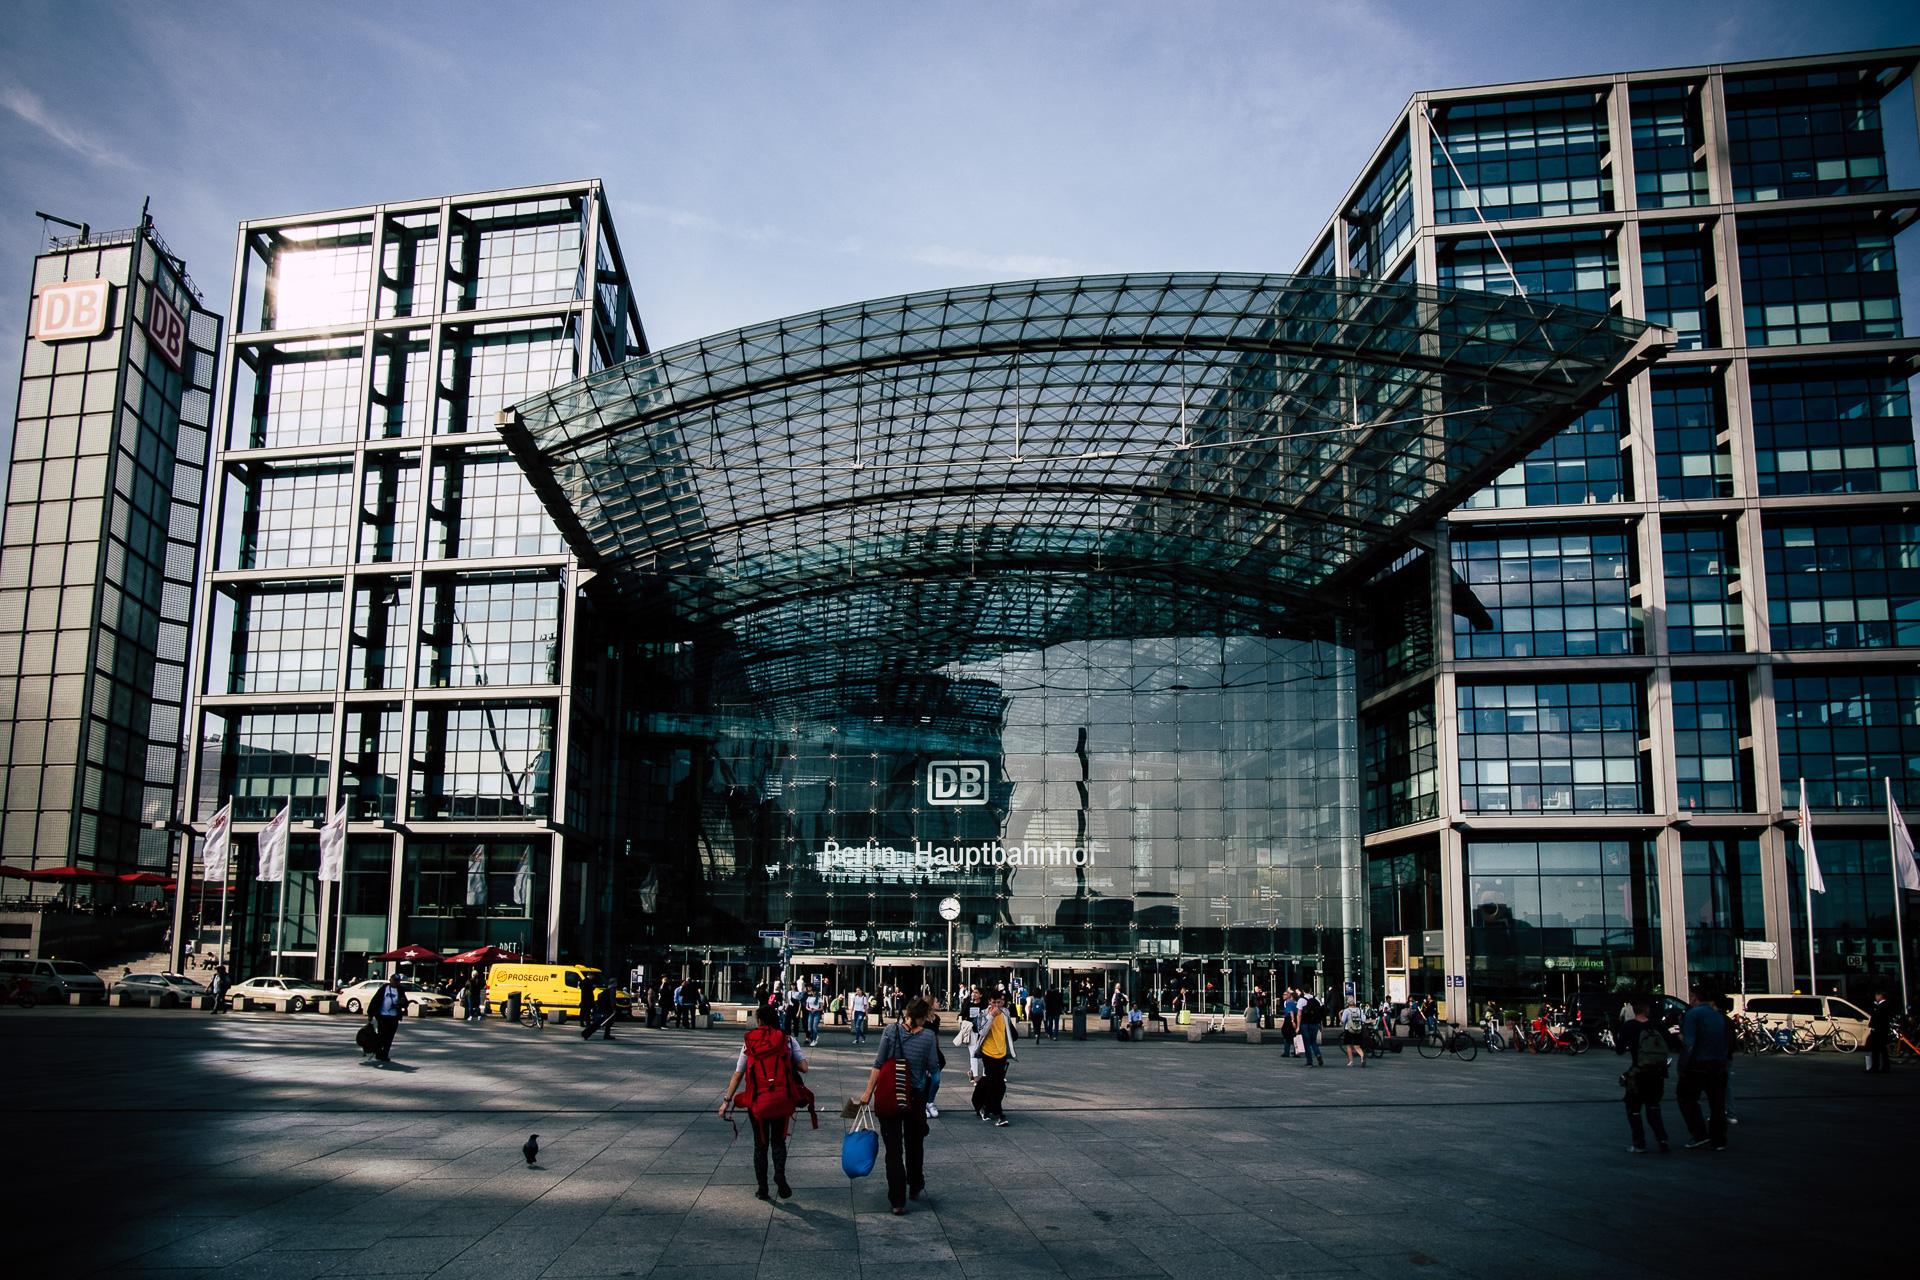 Ekvidi Berlin Hauptbahnhof